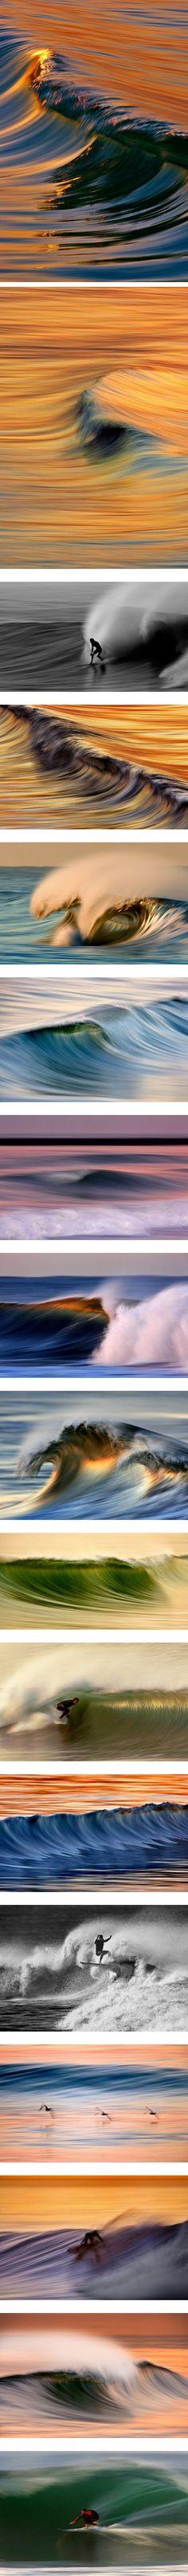 David Orias Sun Tide Waves Photography